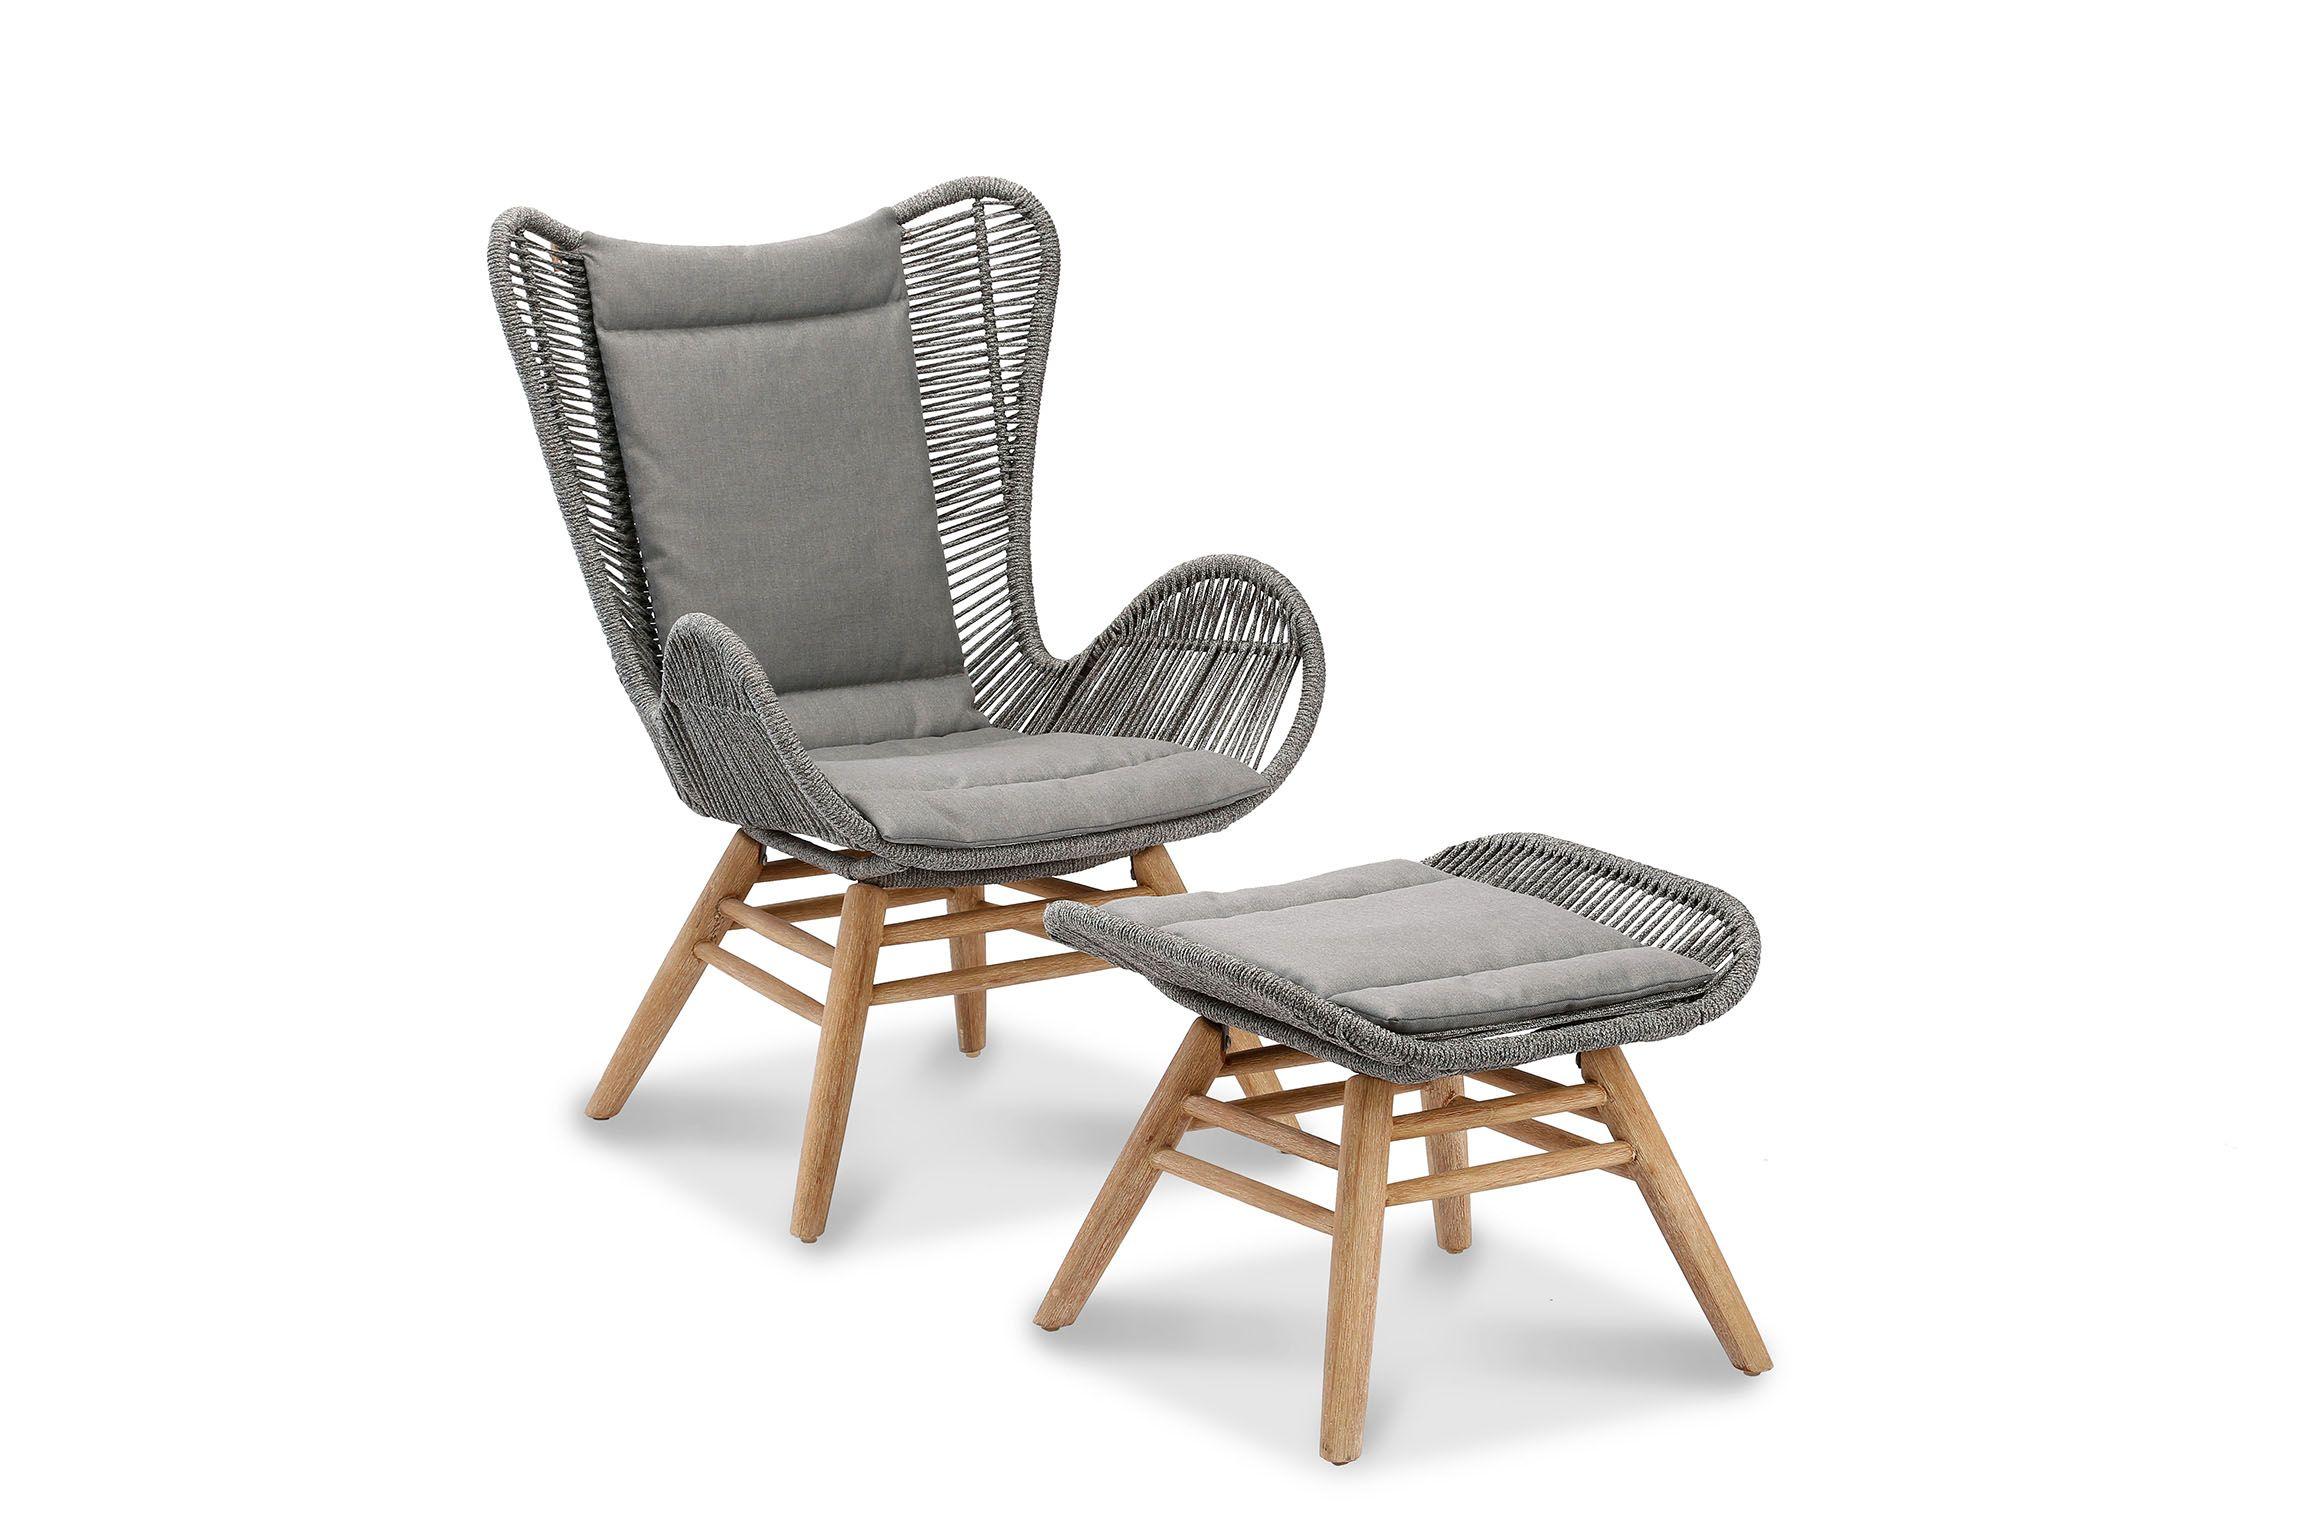 Relax Sessel Fur Den Garten Relaxsessel Mit Hocker Sessel Relaxsessel